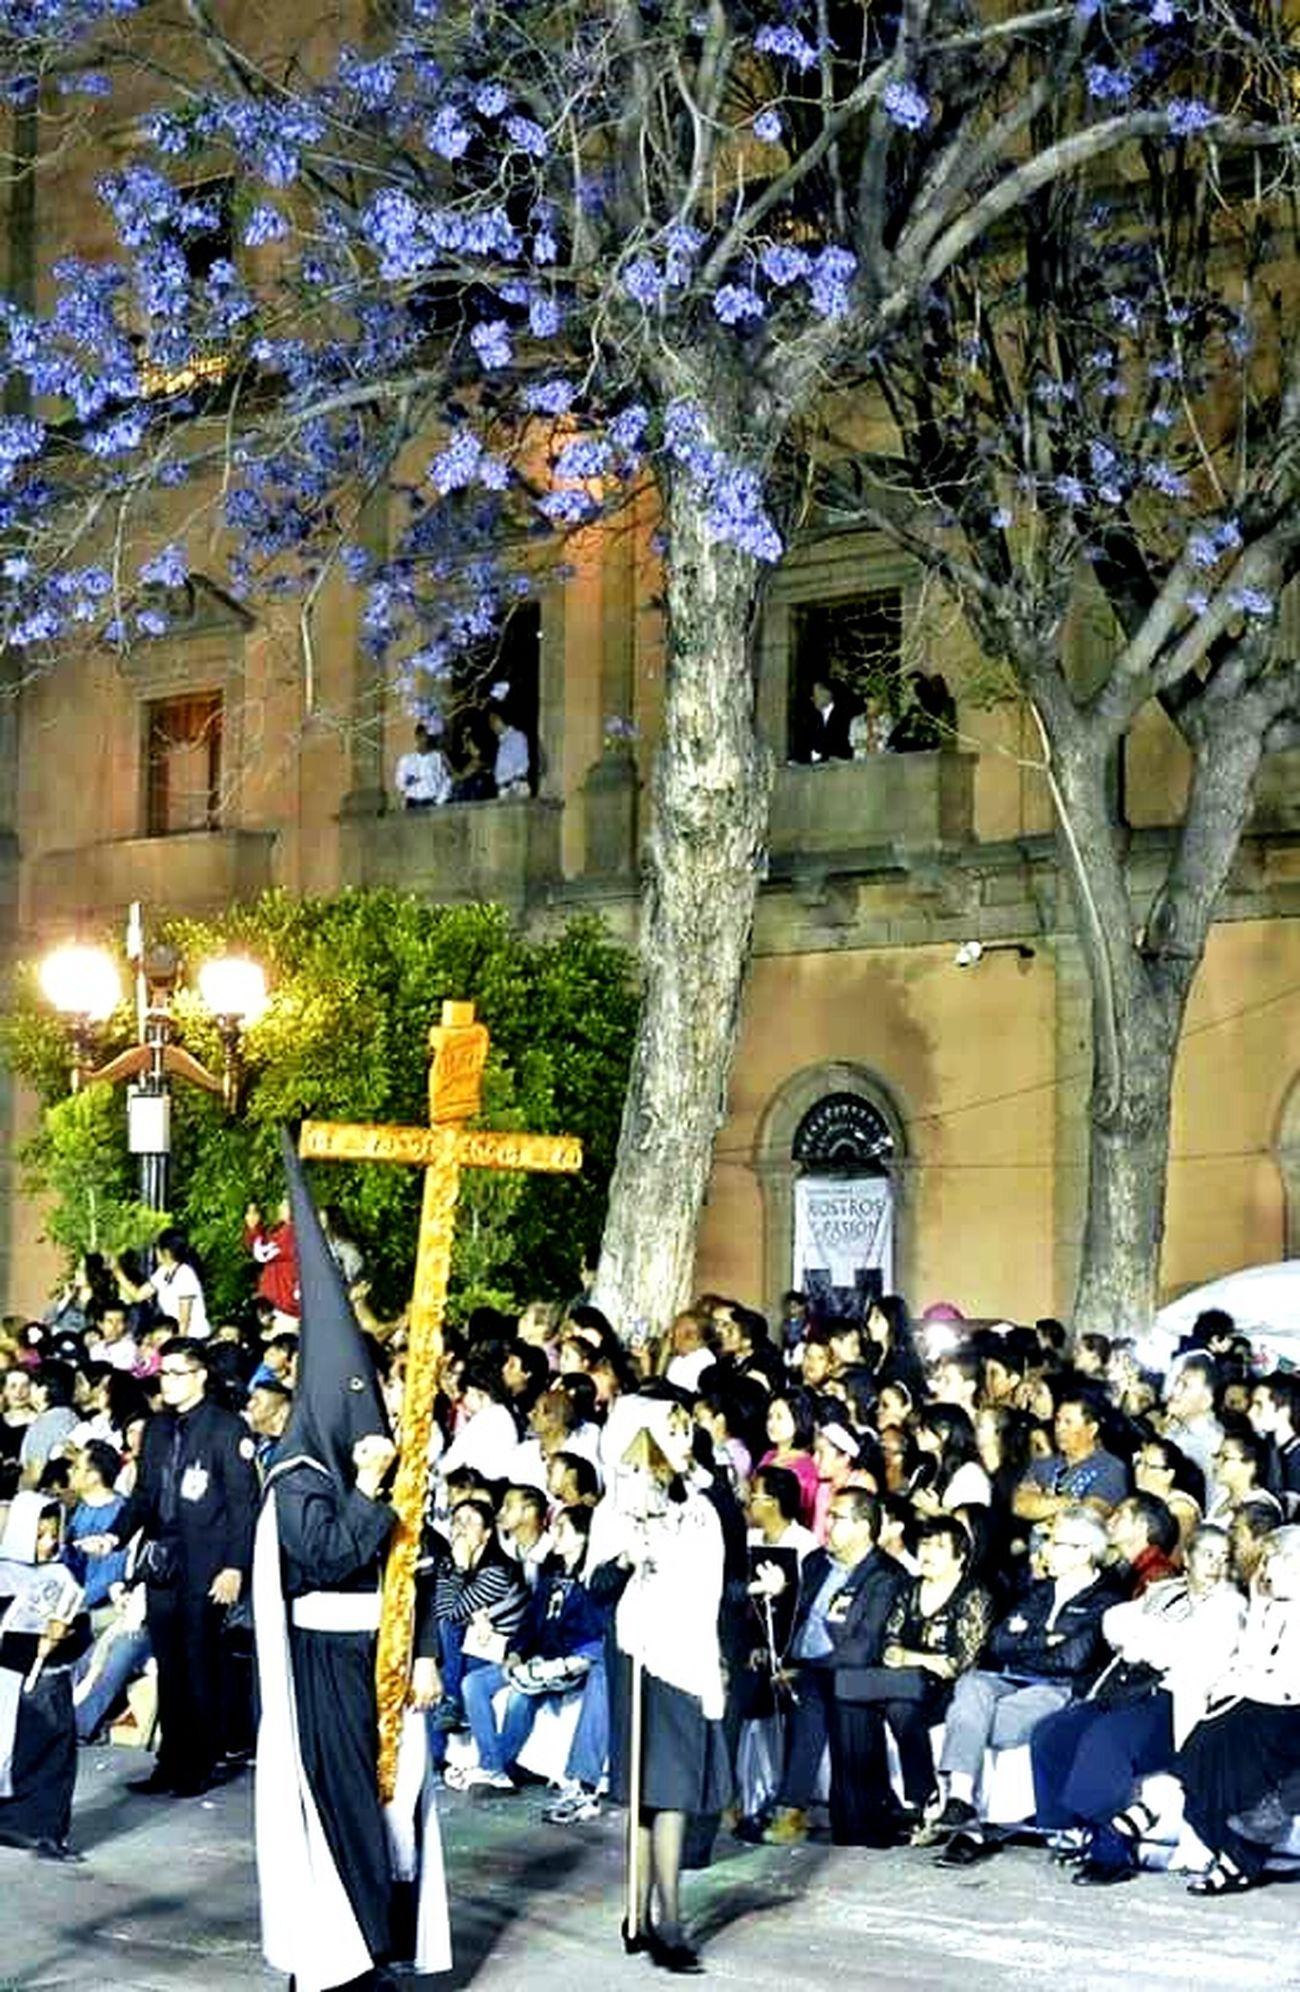 Urban Spring Fever Taking Photos Hello World Enjoying Life My Work Place Photography Colorful San Luis Potosí Procesion Del Silencio Procession Processione Semana Santa